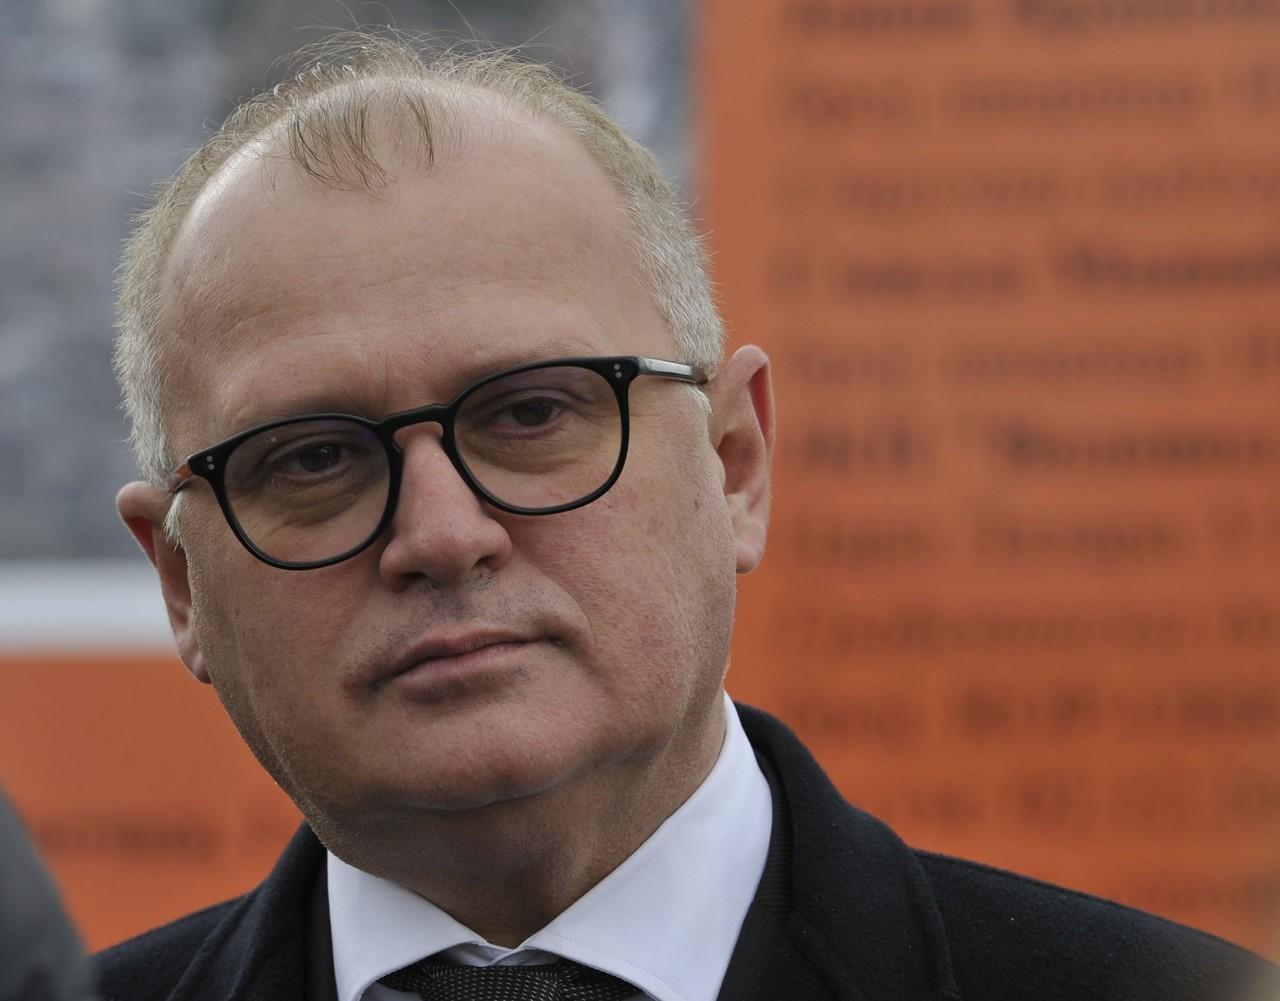 Deputy Mayor says Belgrade lost more than 220 million Euro in tourism revenue